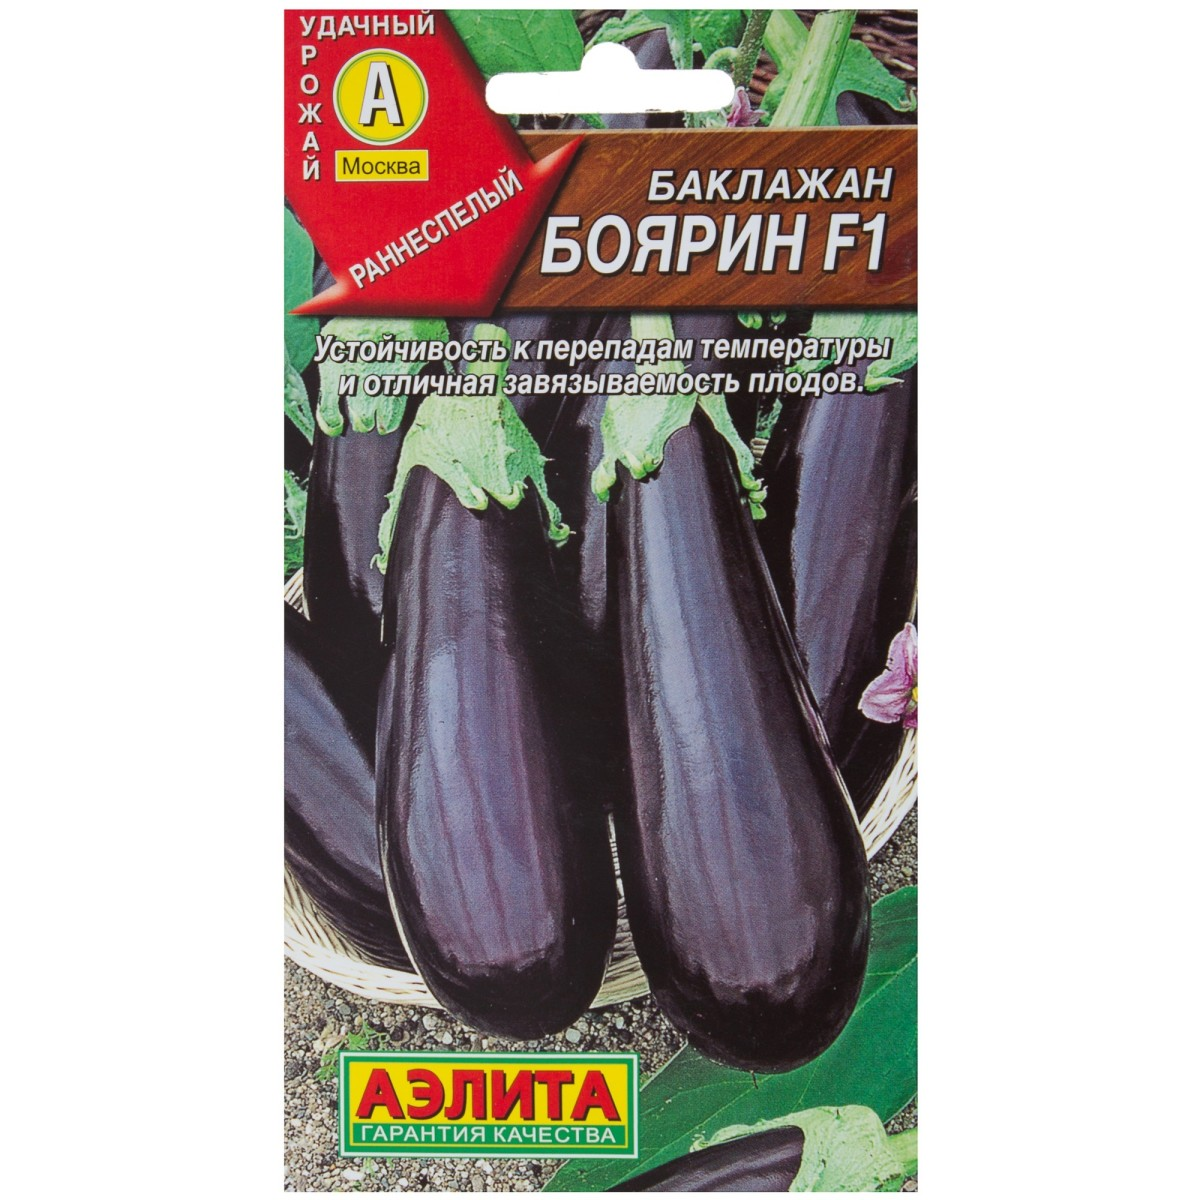 Семена Баклажан Боярин F1 0.2 г